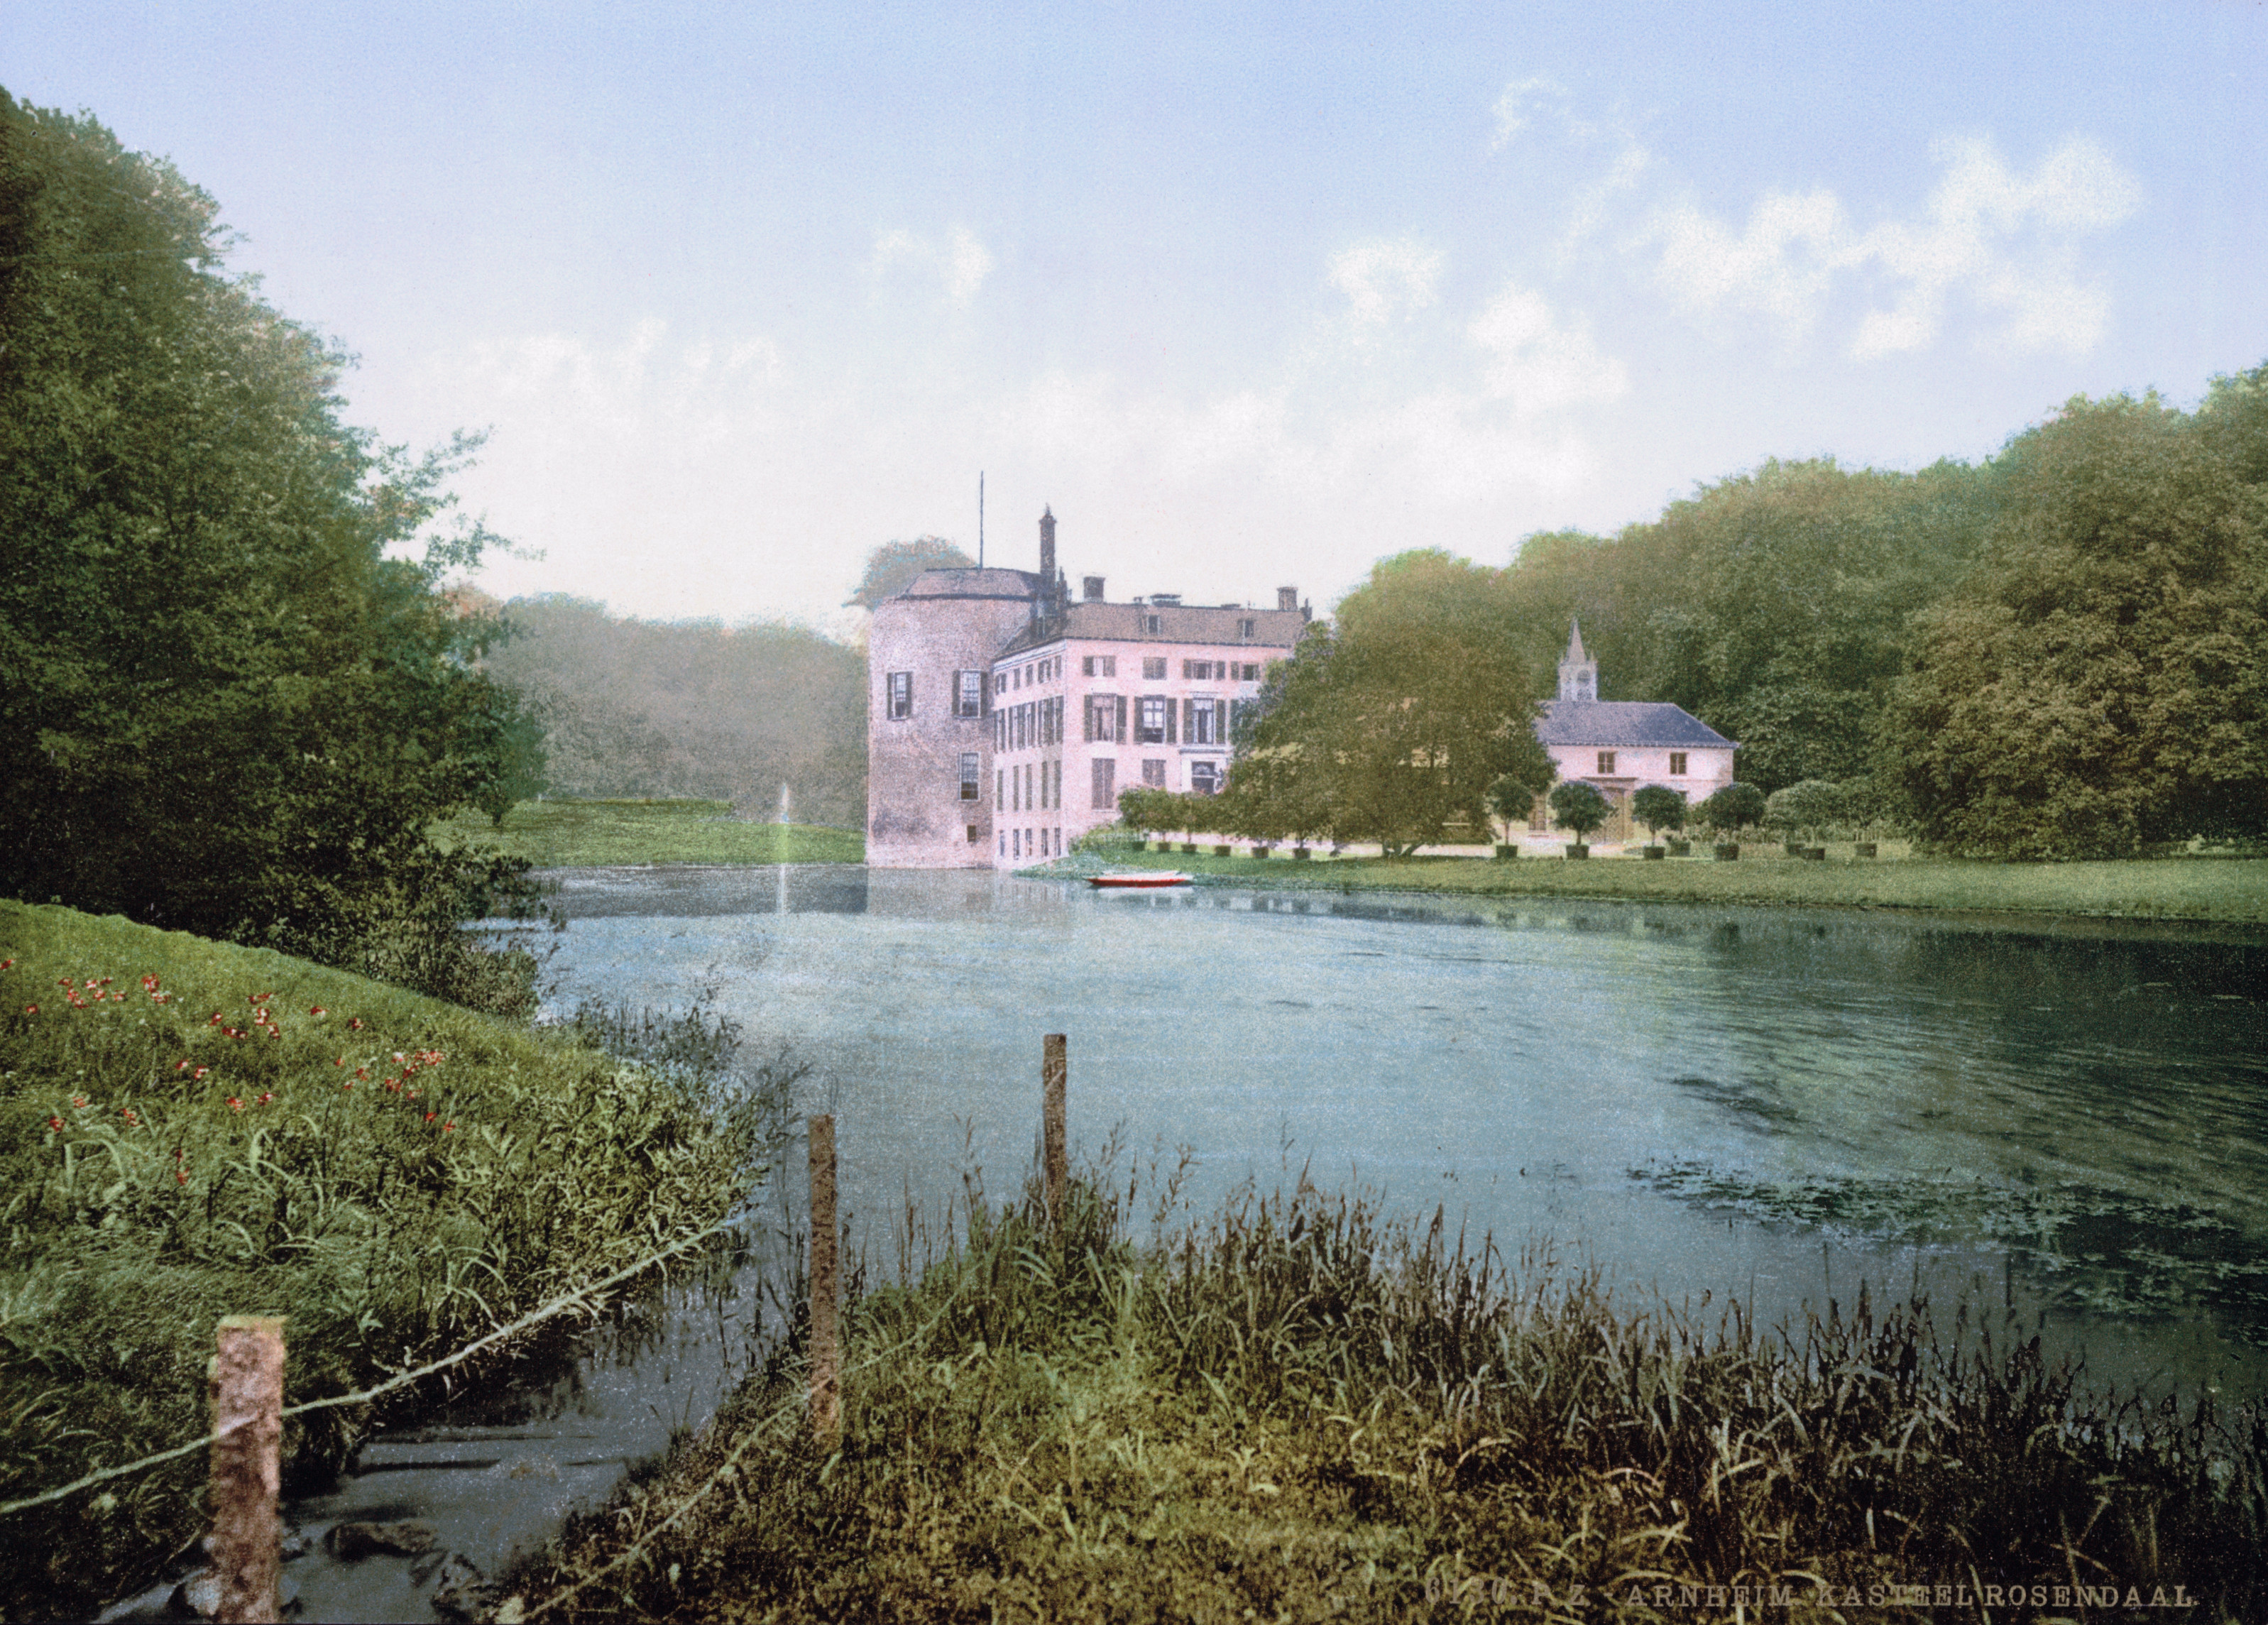 File:Arnhem - Kasteel Rosendael 1900.jpg - Wikimedia Commons